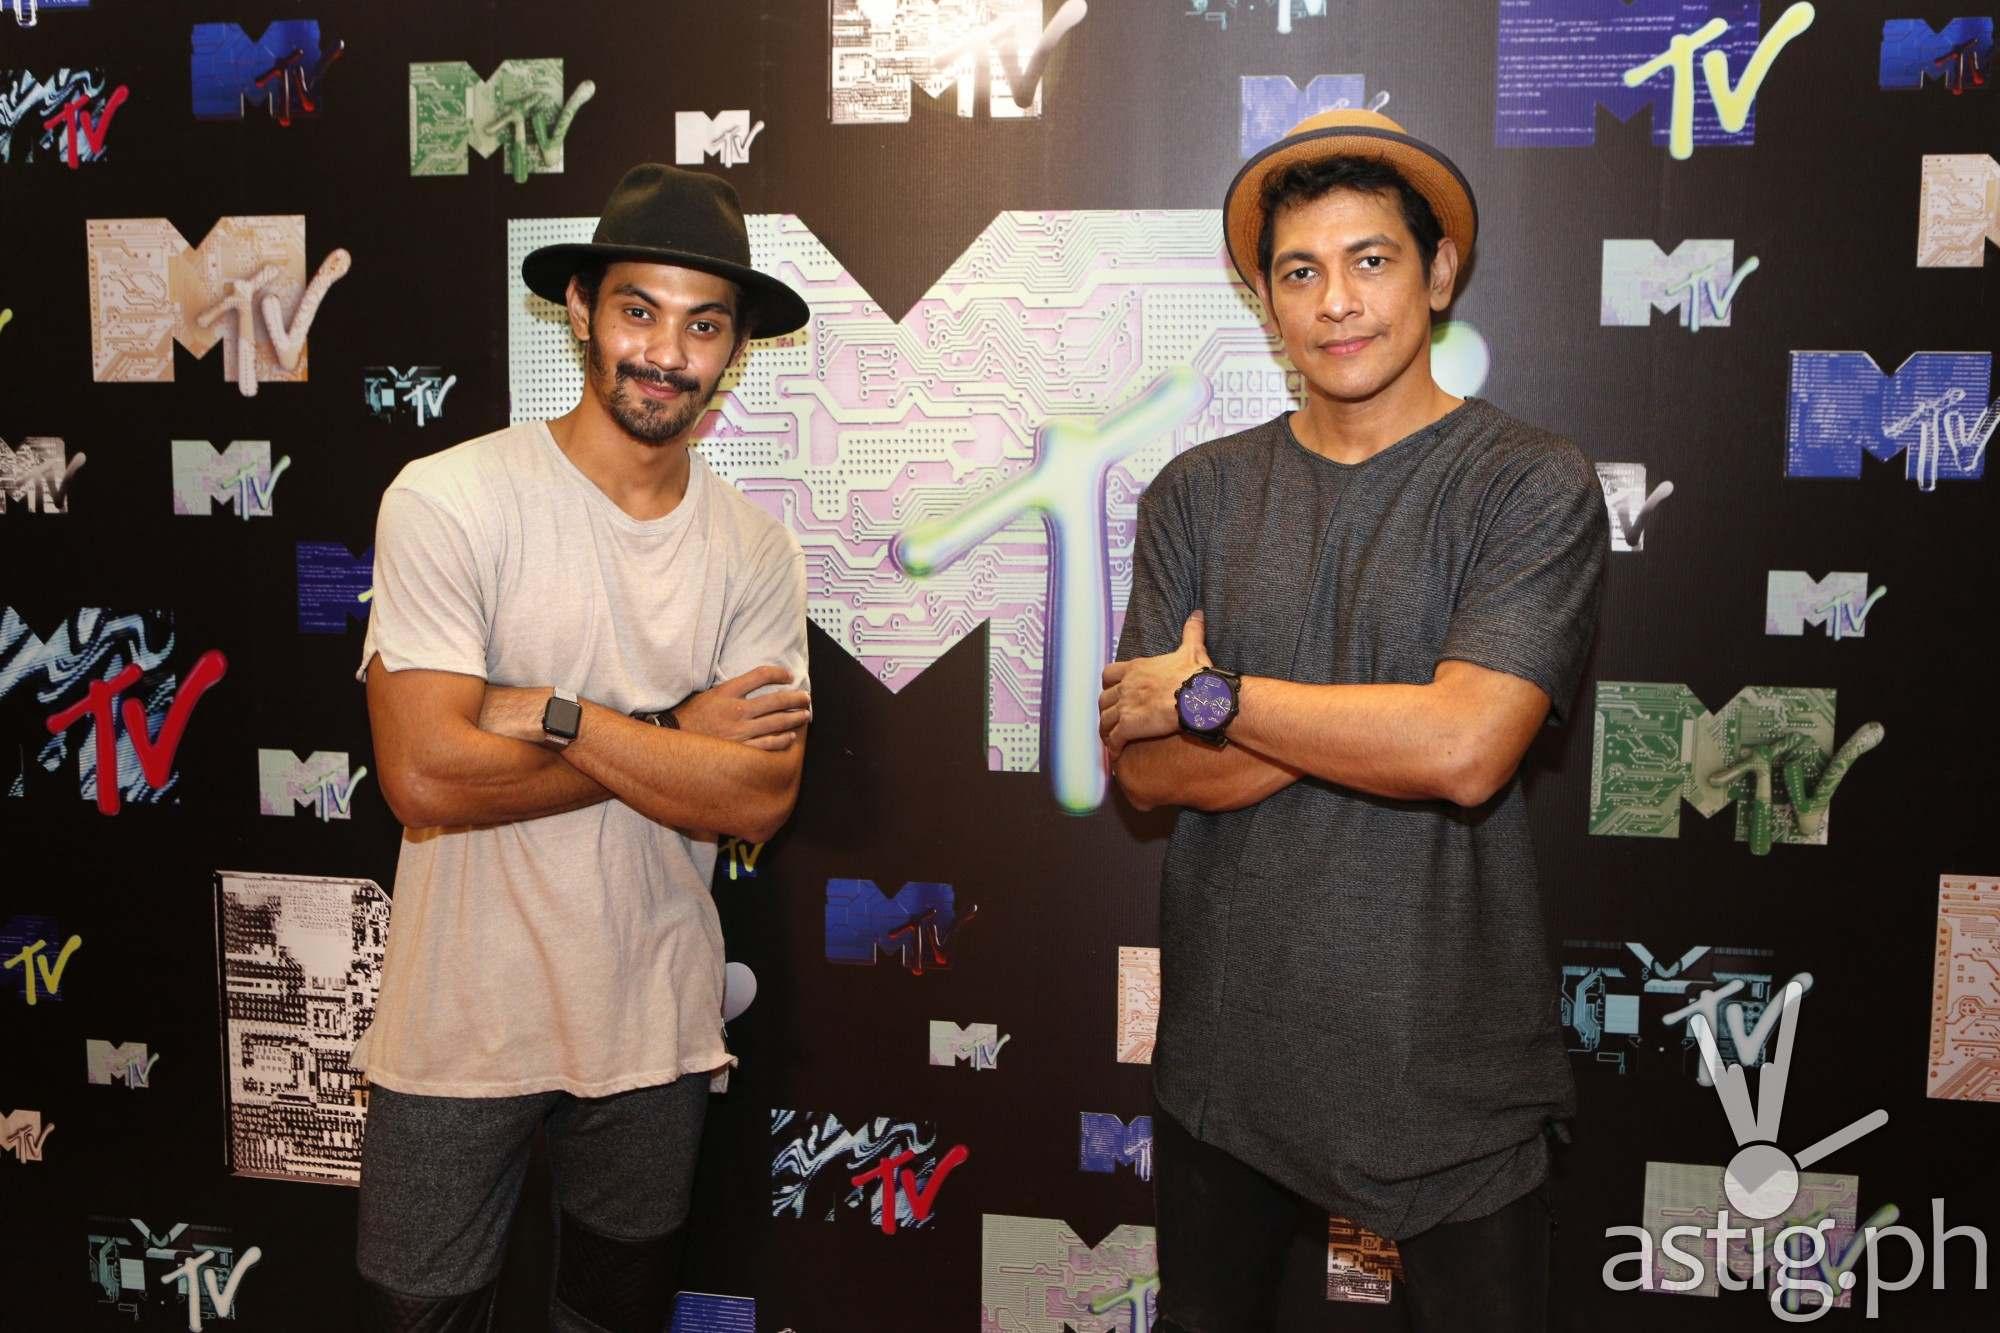 Gab and Gary V electrifies crowd at MTV Music Evo 2016